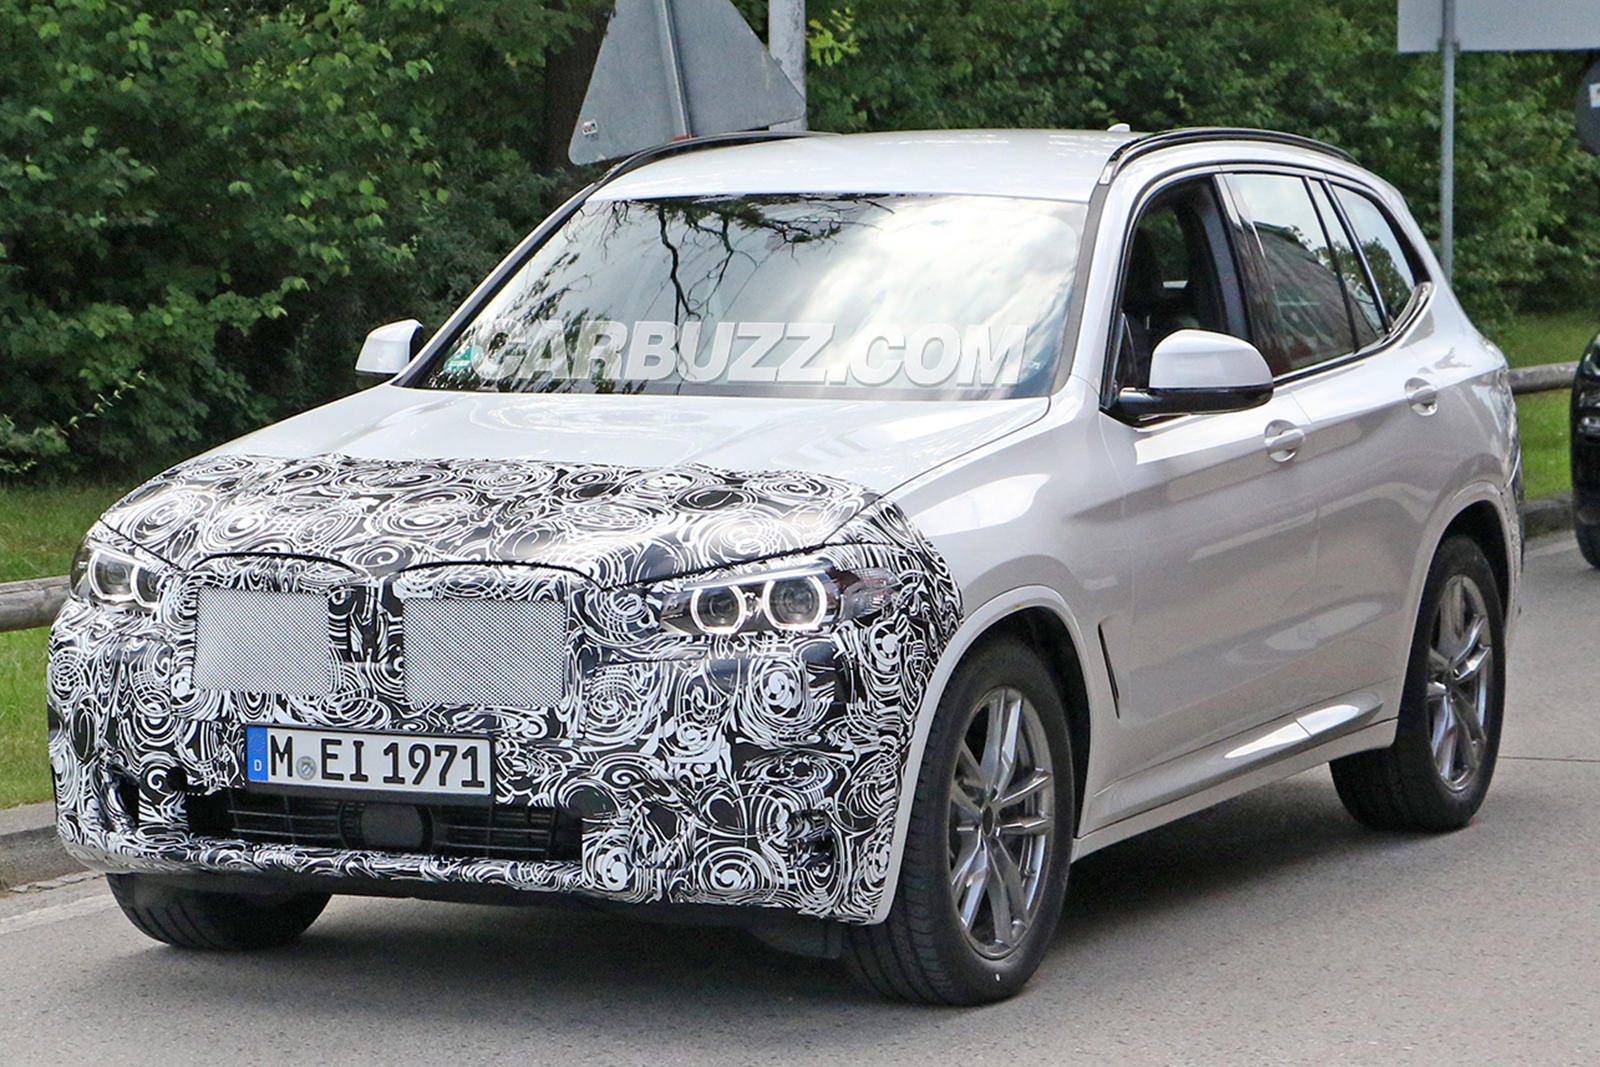 New BMW X3 Looks Ready To Battle Audi Q5